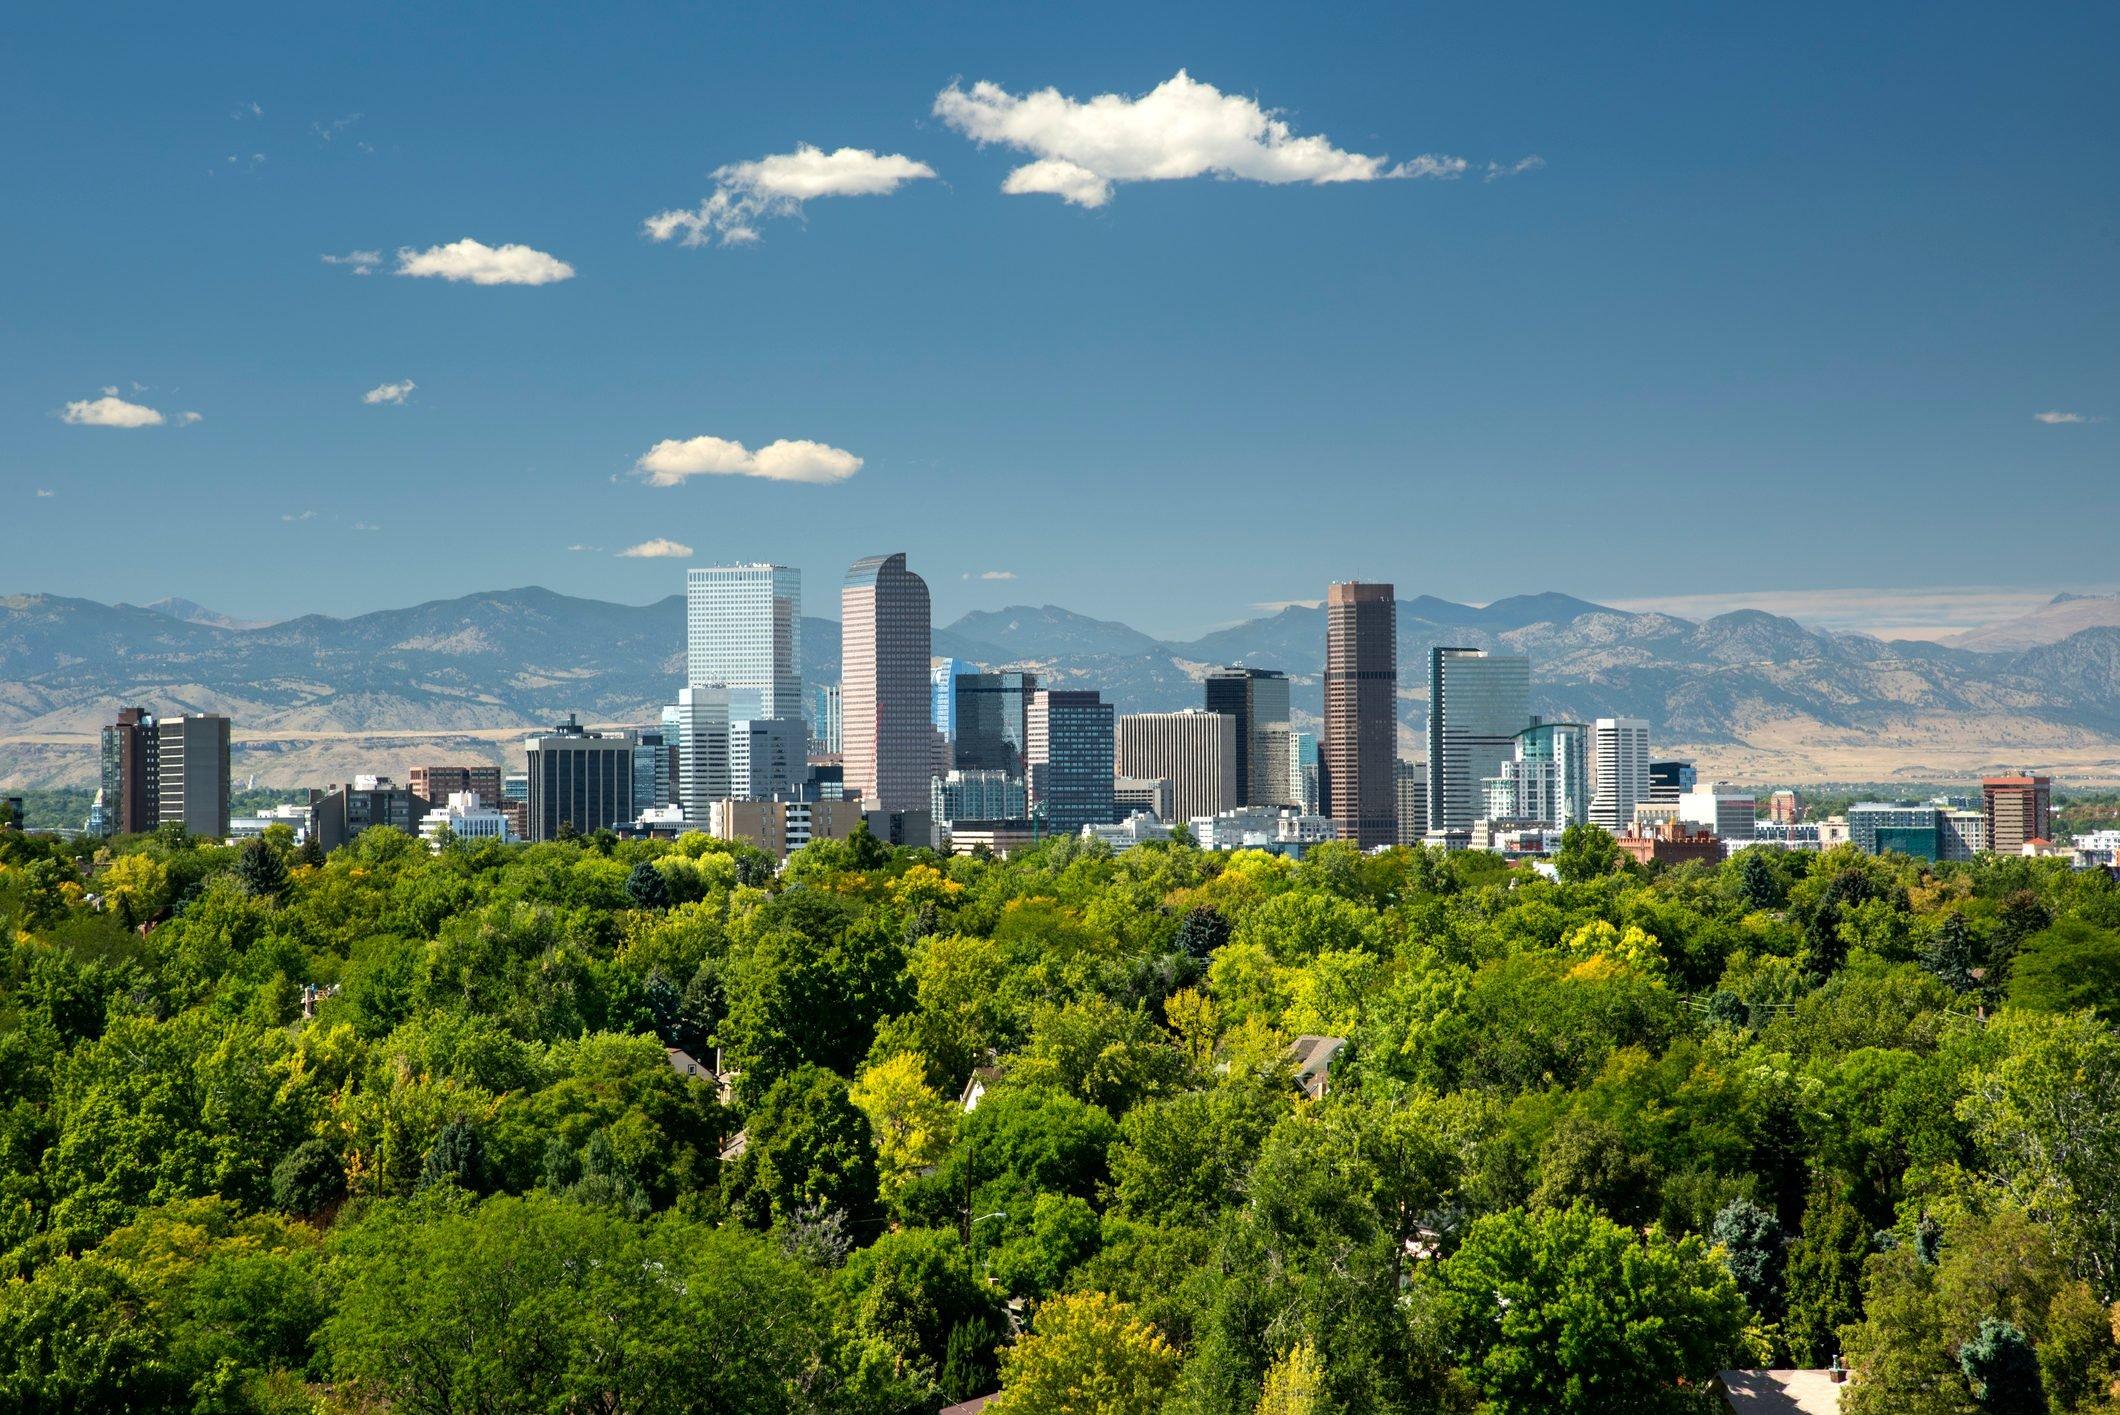 Skyline, Neighborhoods, Front Range, Rocky Mountains, Denver, Colorado